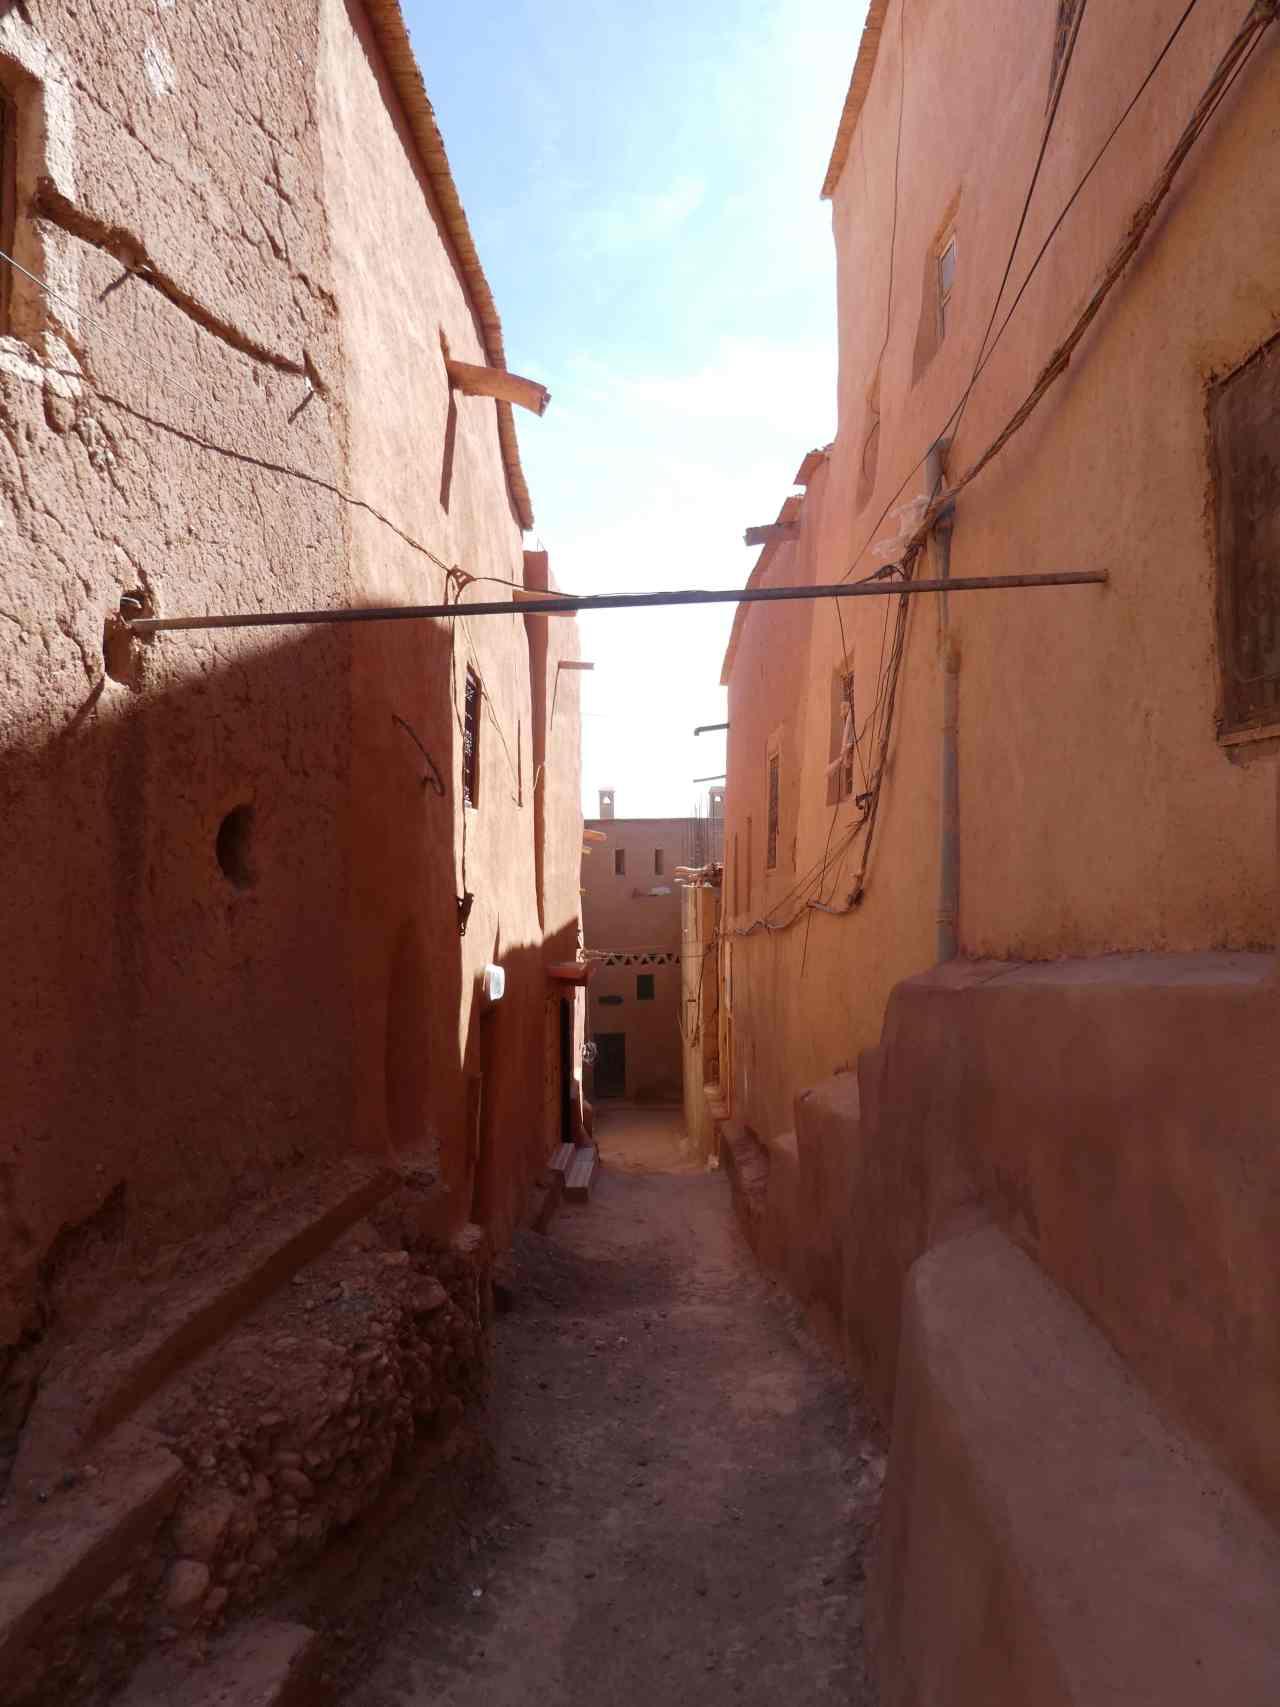 Street in Ouarzazate Morocco